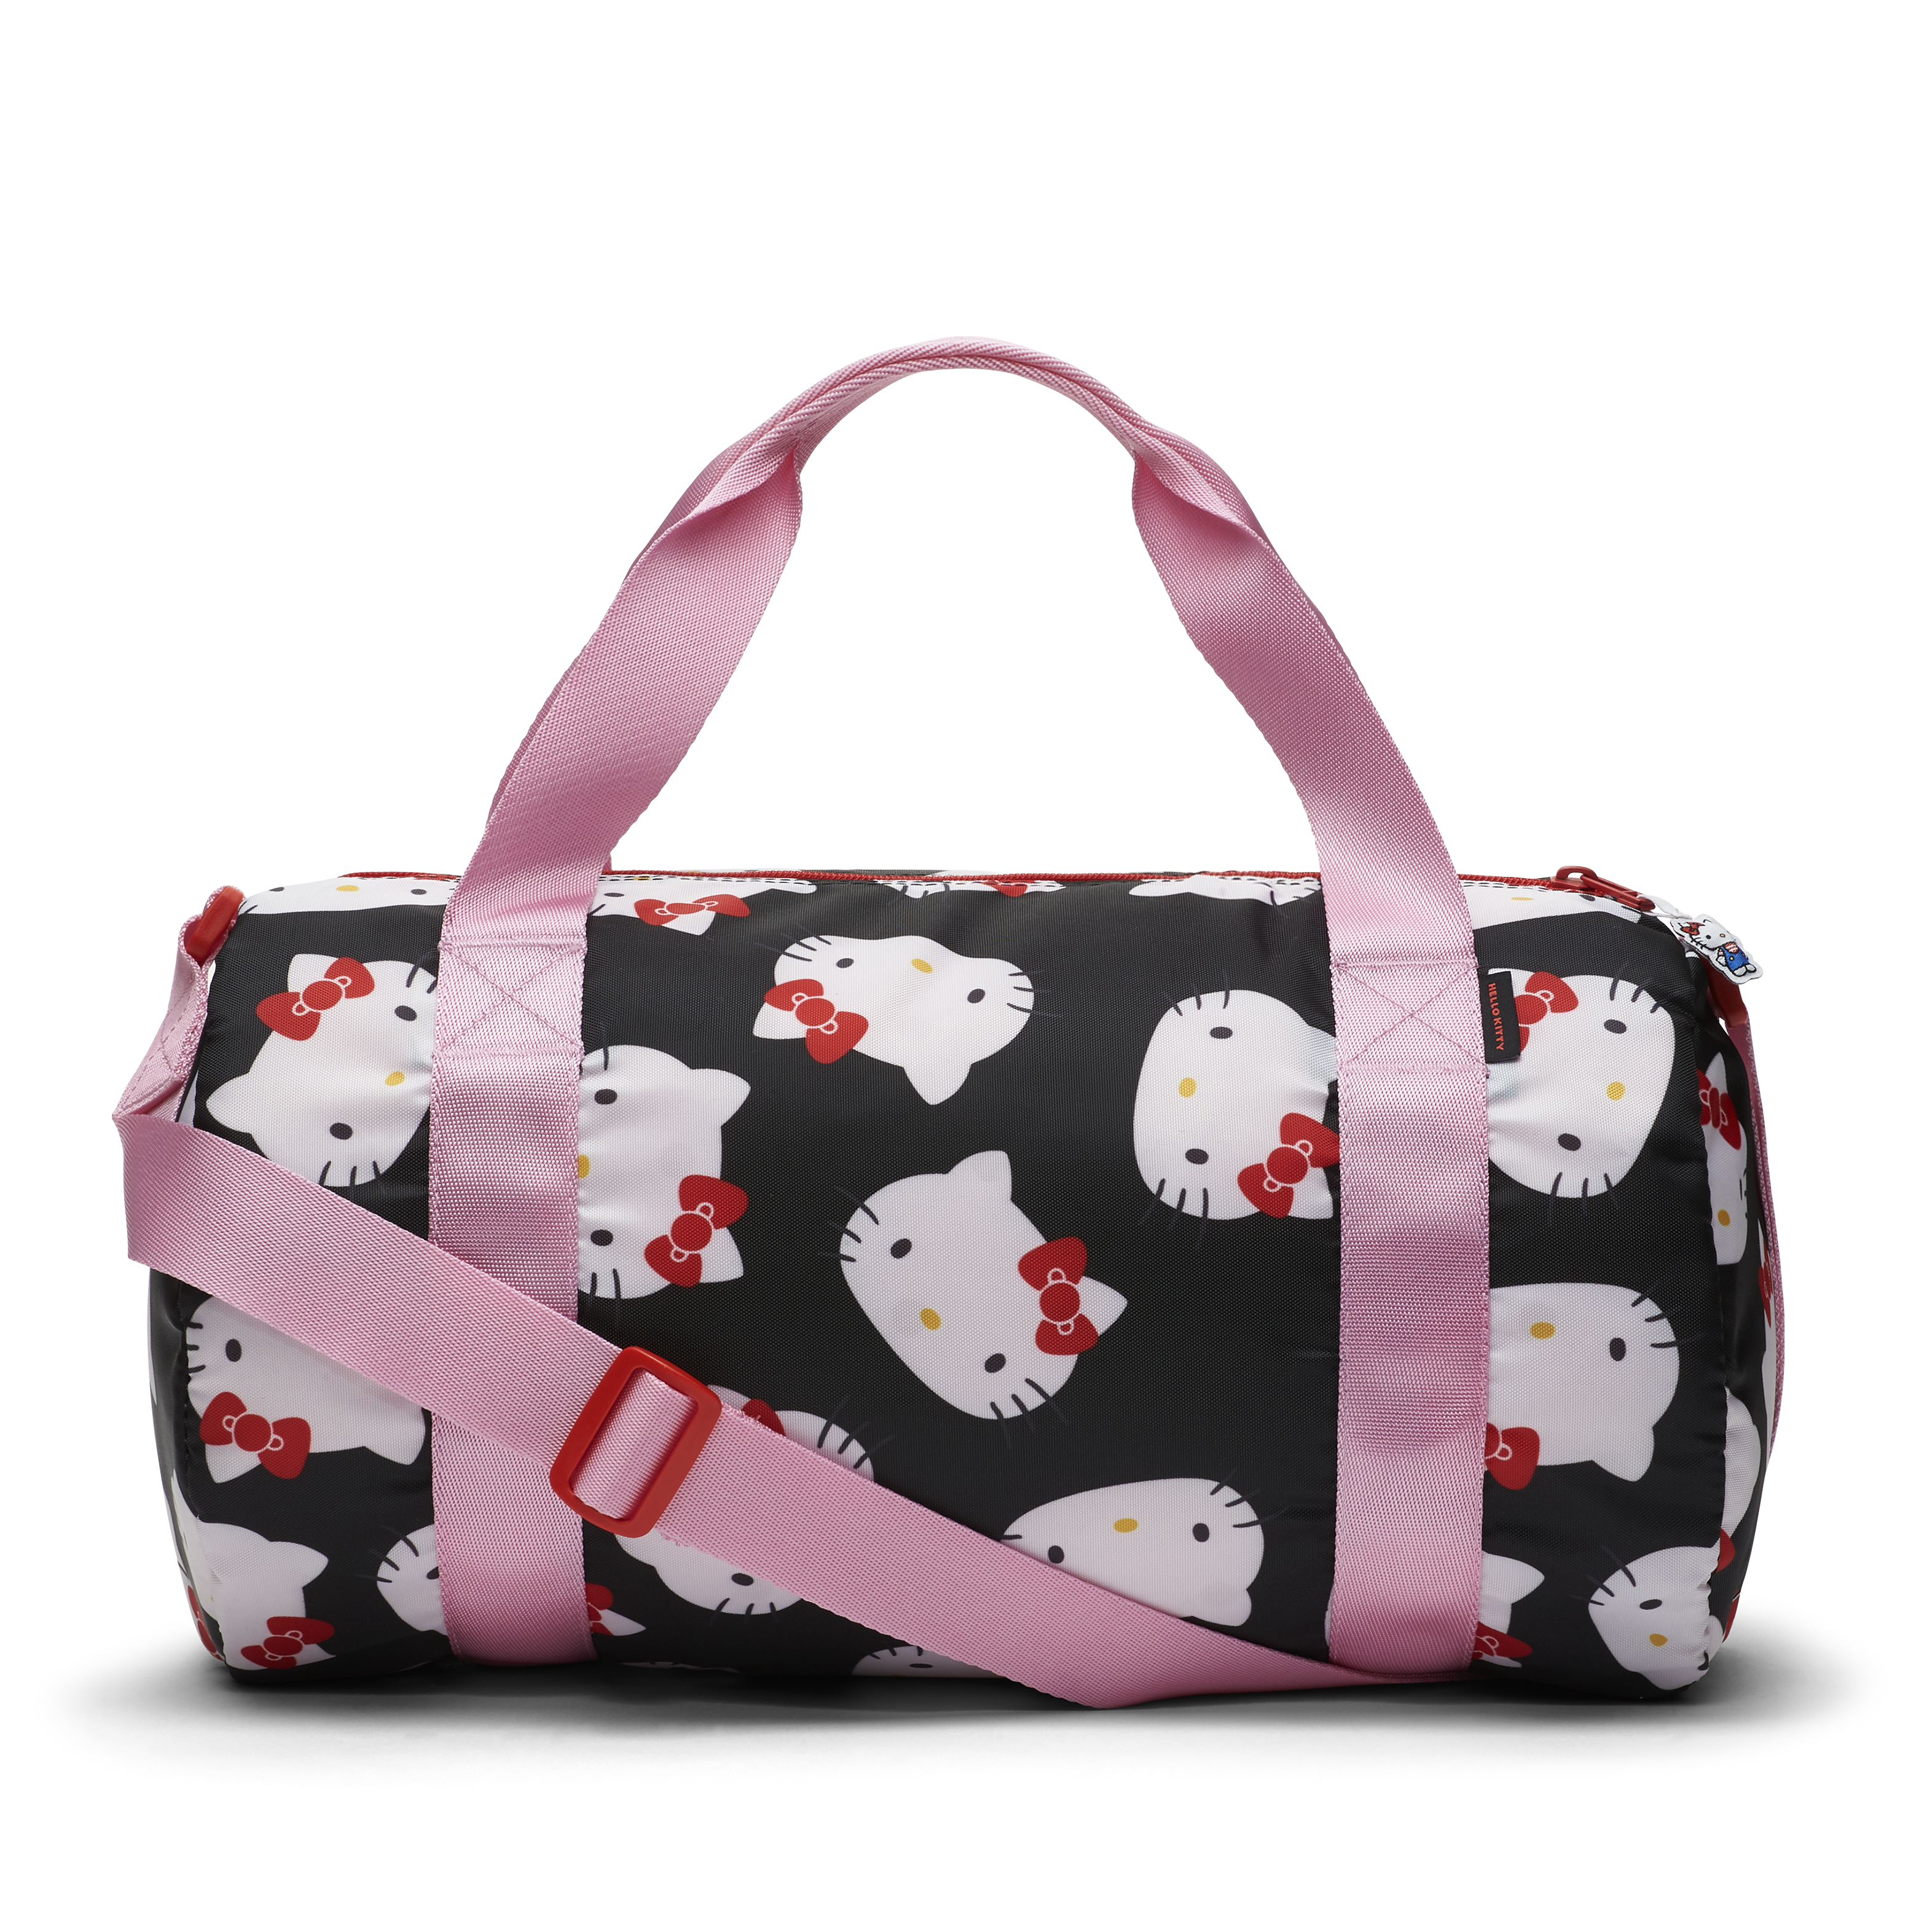 4280b24dd Sanrio x Converse to Release Hello Kitty Sneakers